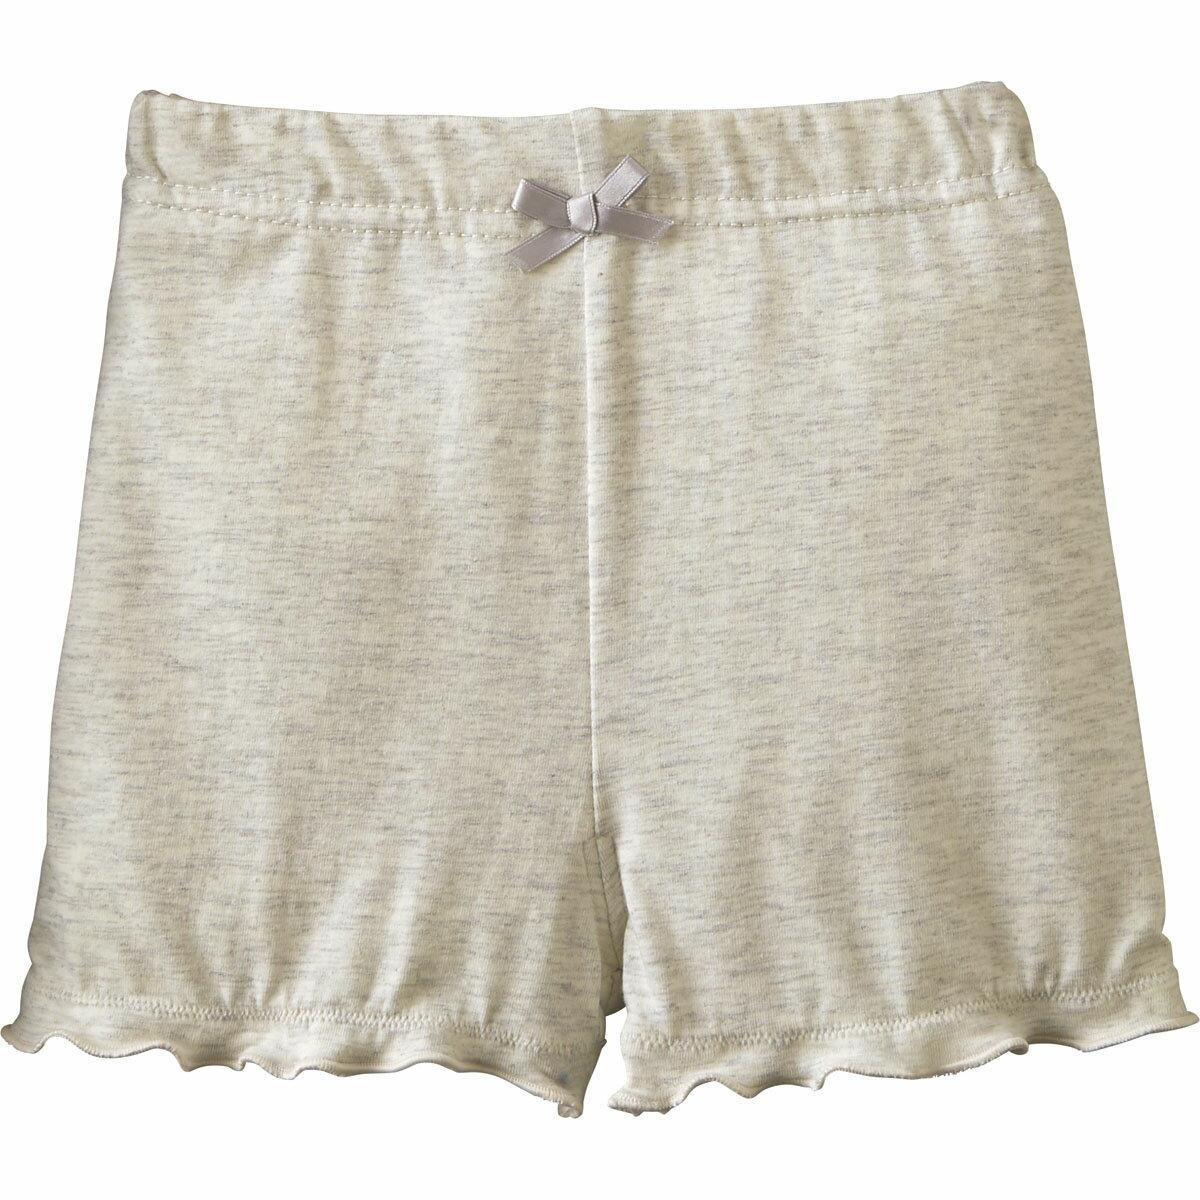 【20%OFF】オーバーパンツ《コンビミニ》ギフト ベビー服 子供服 Combi mini 女の子 ボトムス 女の子ショートパンツ_Pup